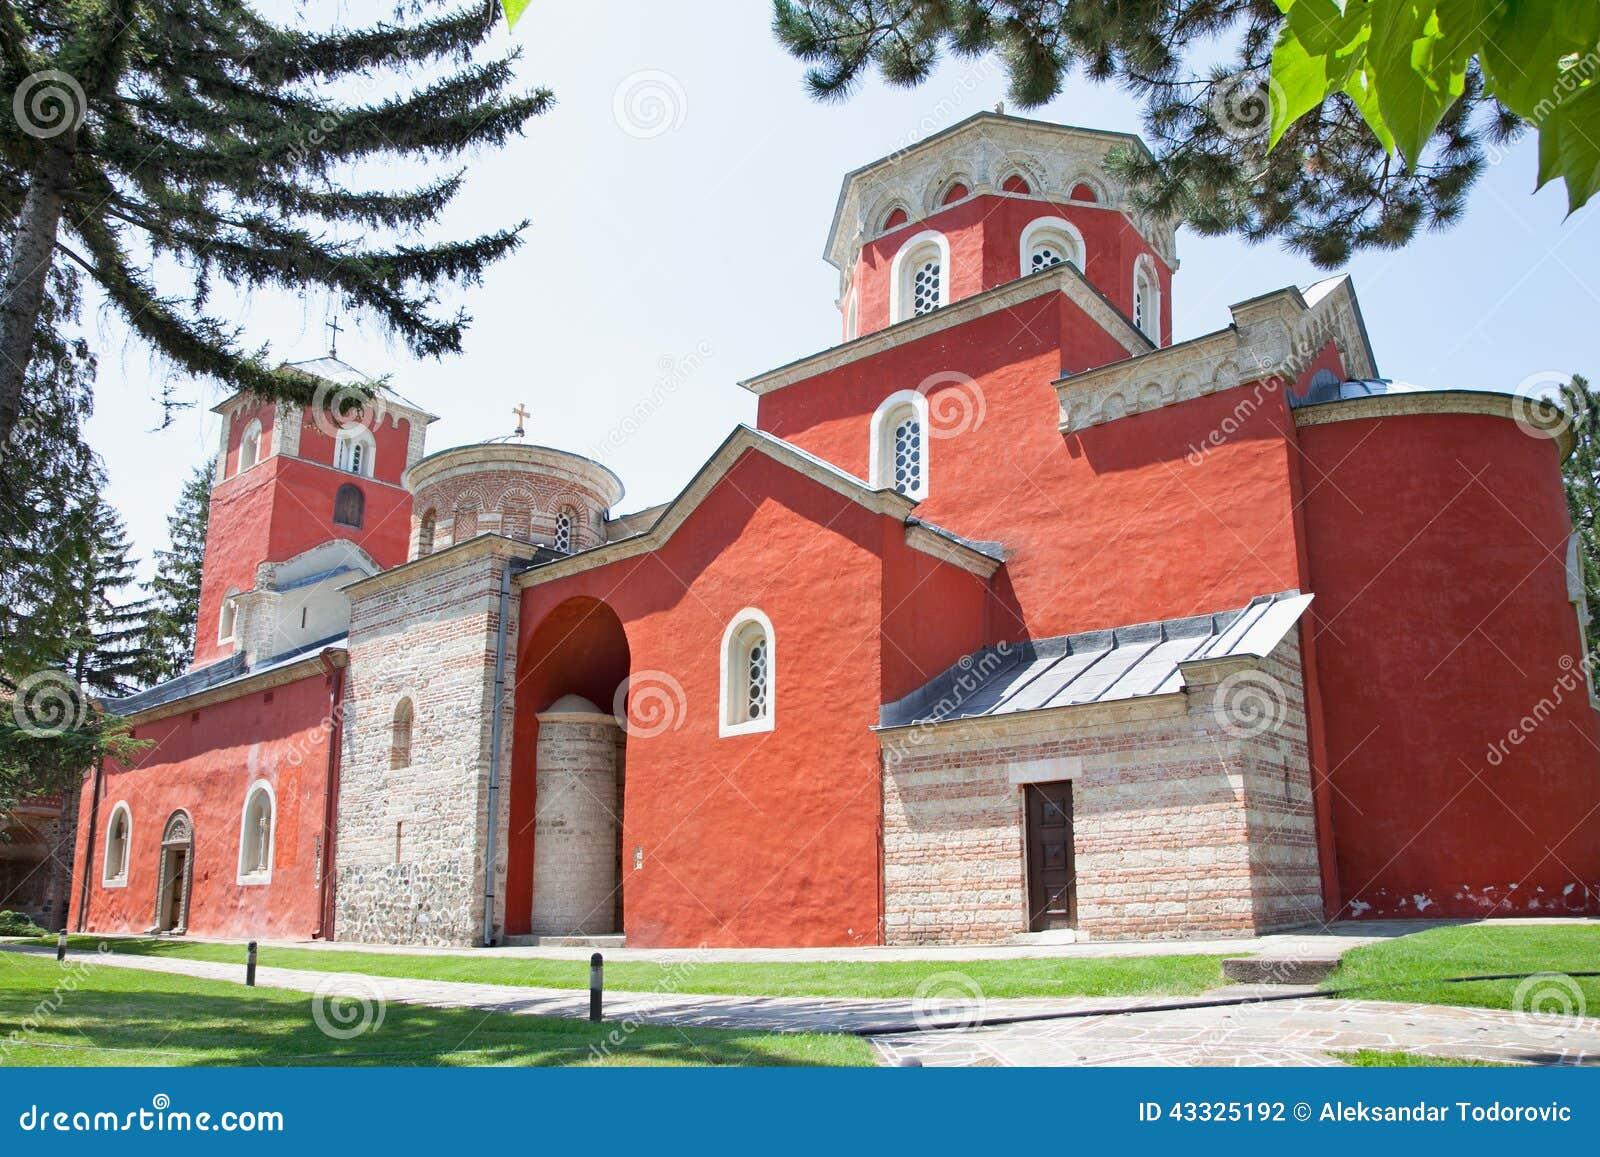 Orthodox Monastery Zica, near Kraljevo, Serbia.